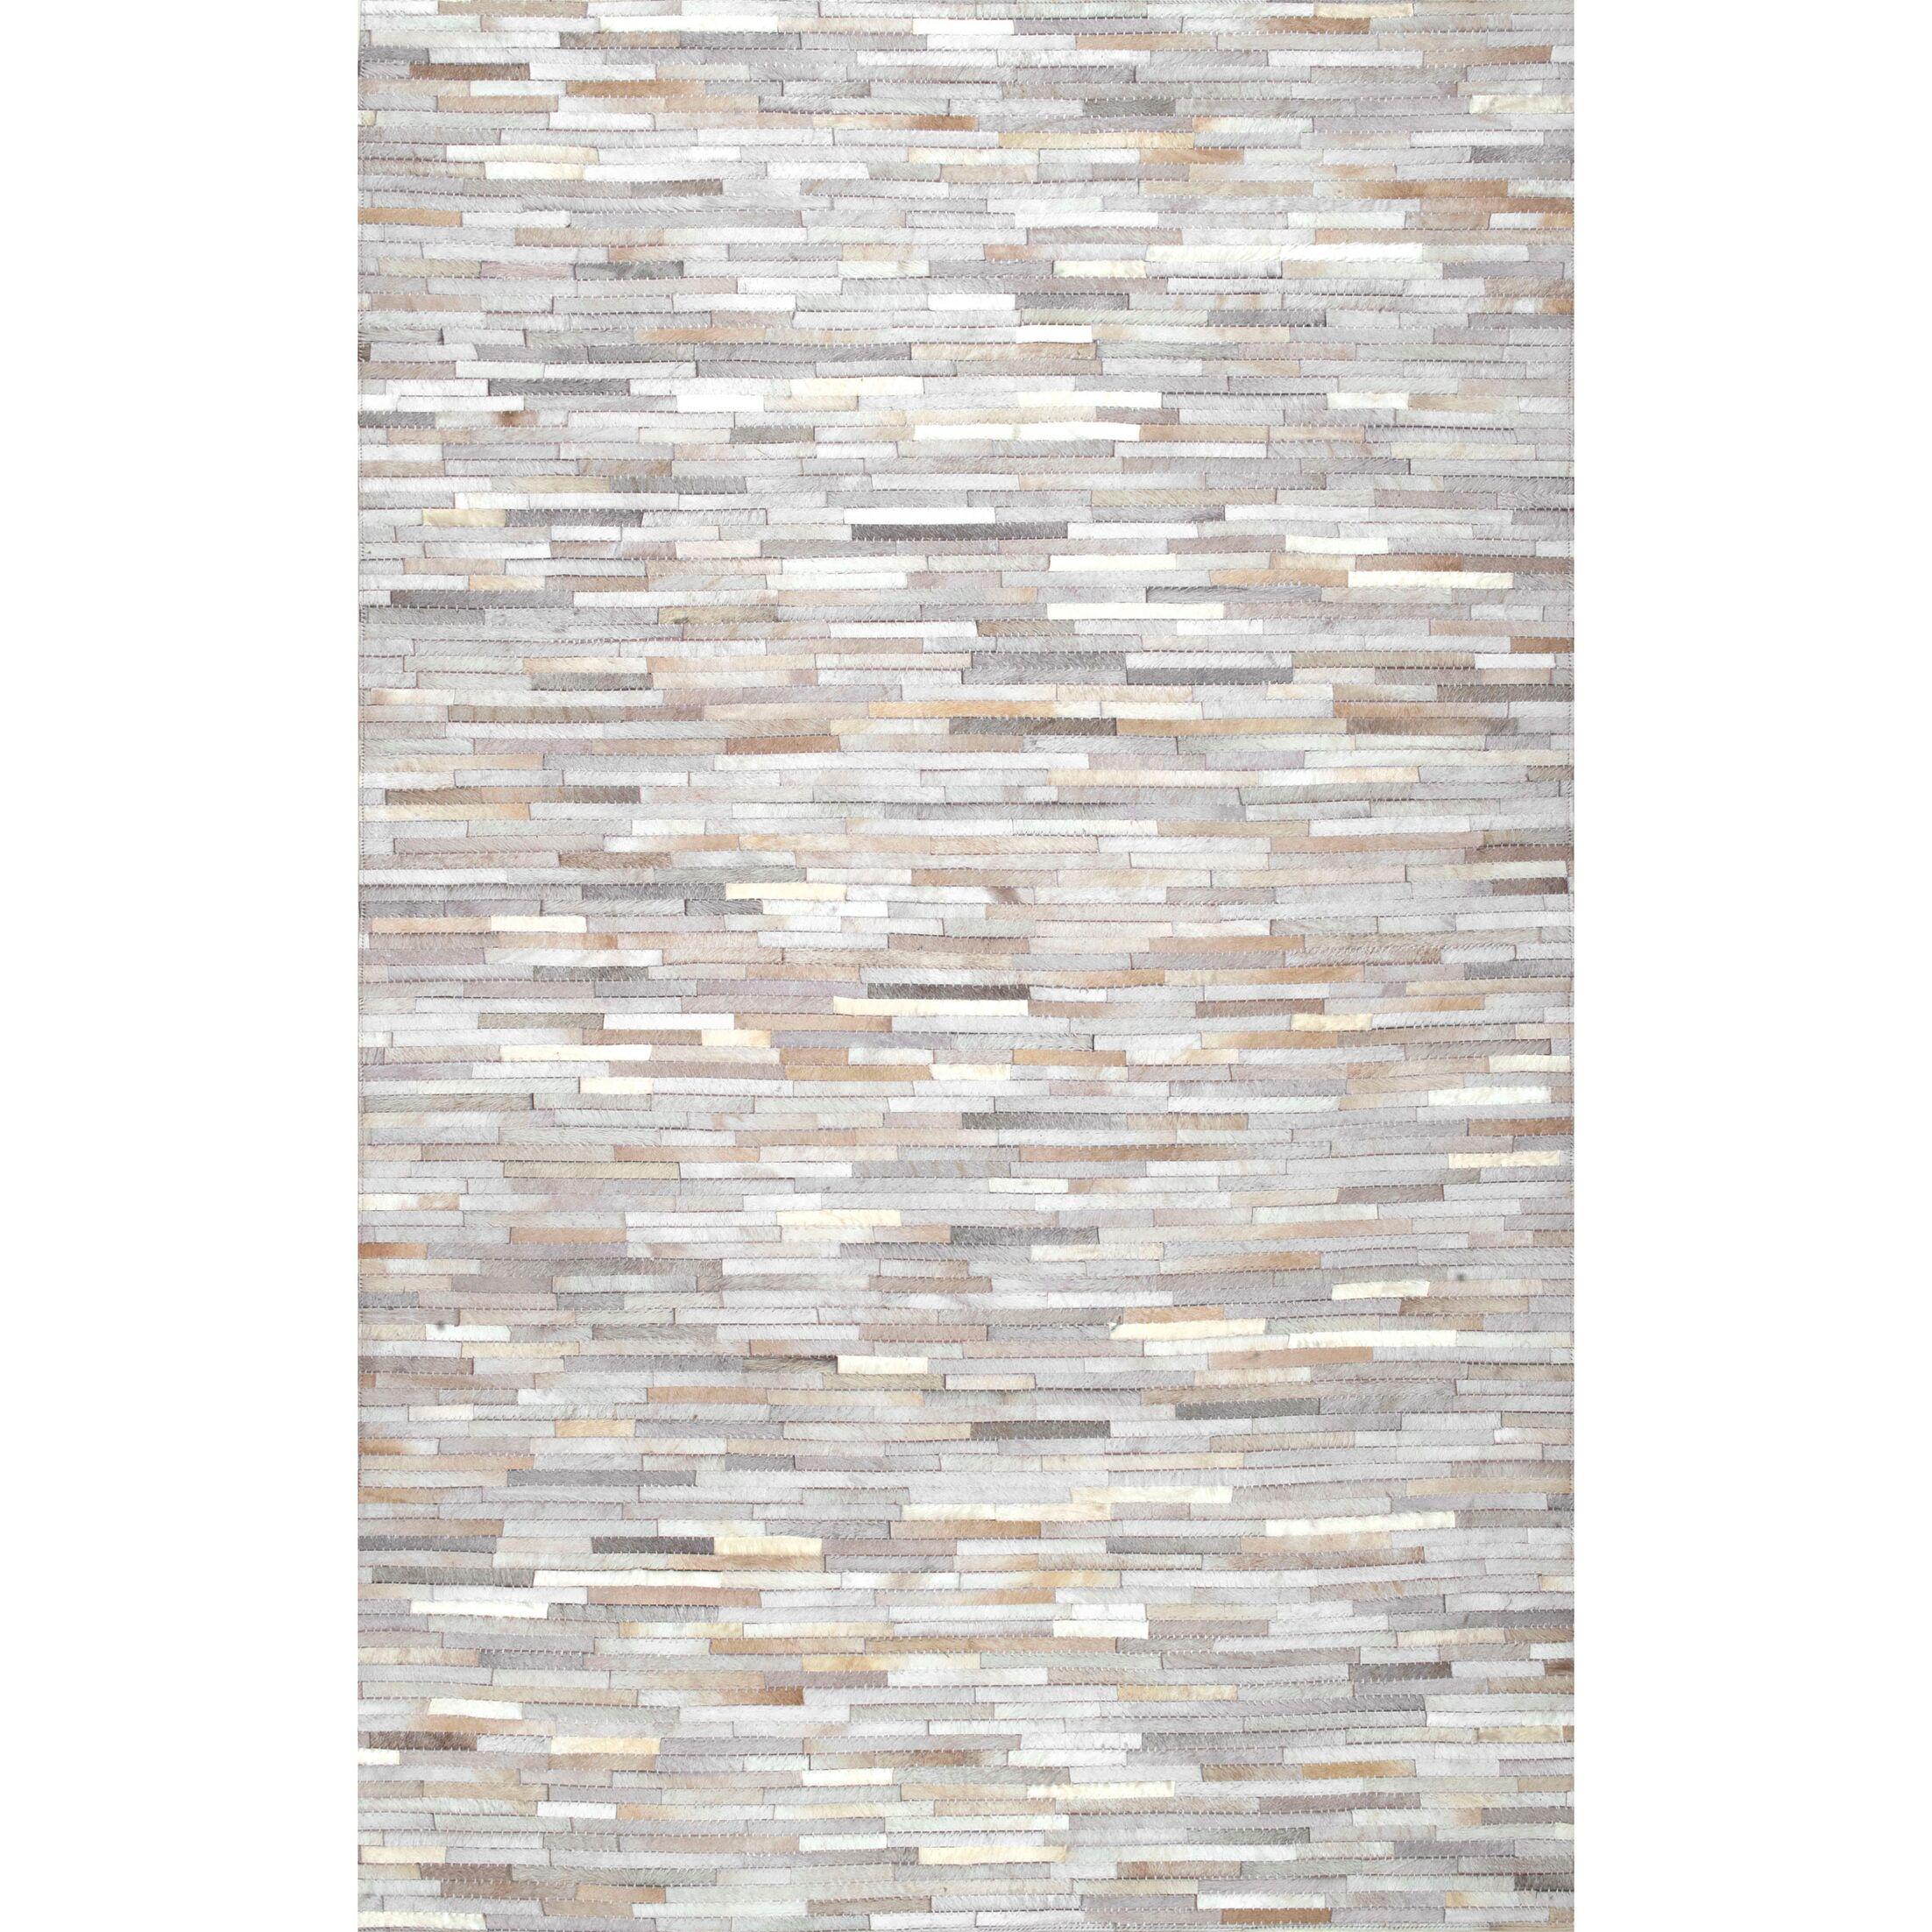 Quaeshia Patchwork Area Rug Rug Size: Rectangle 6' x 9'